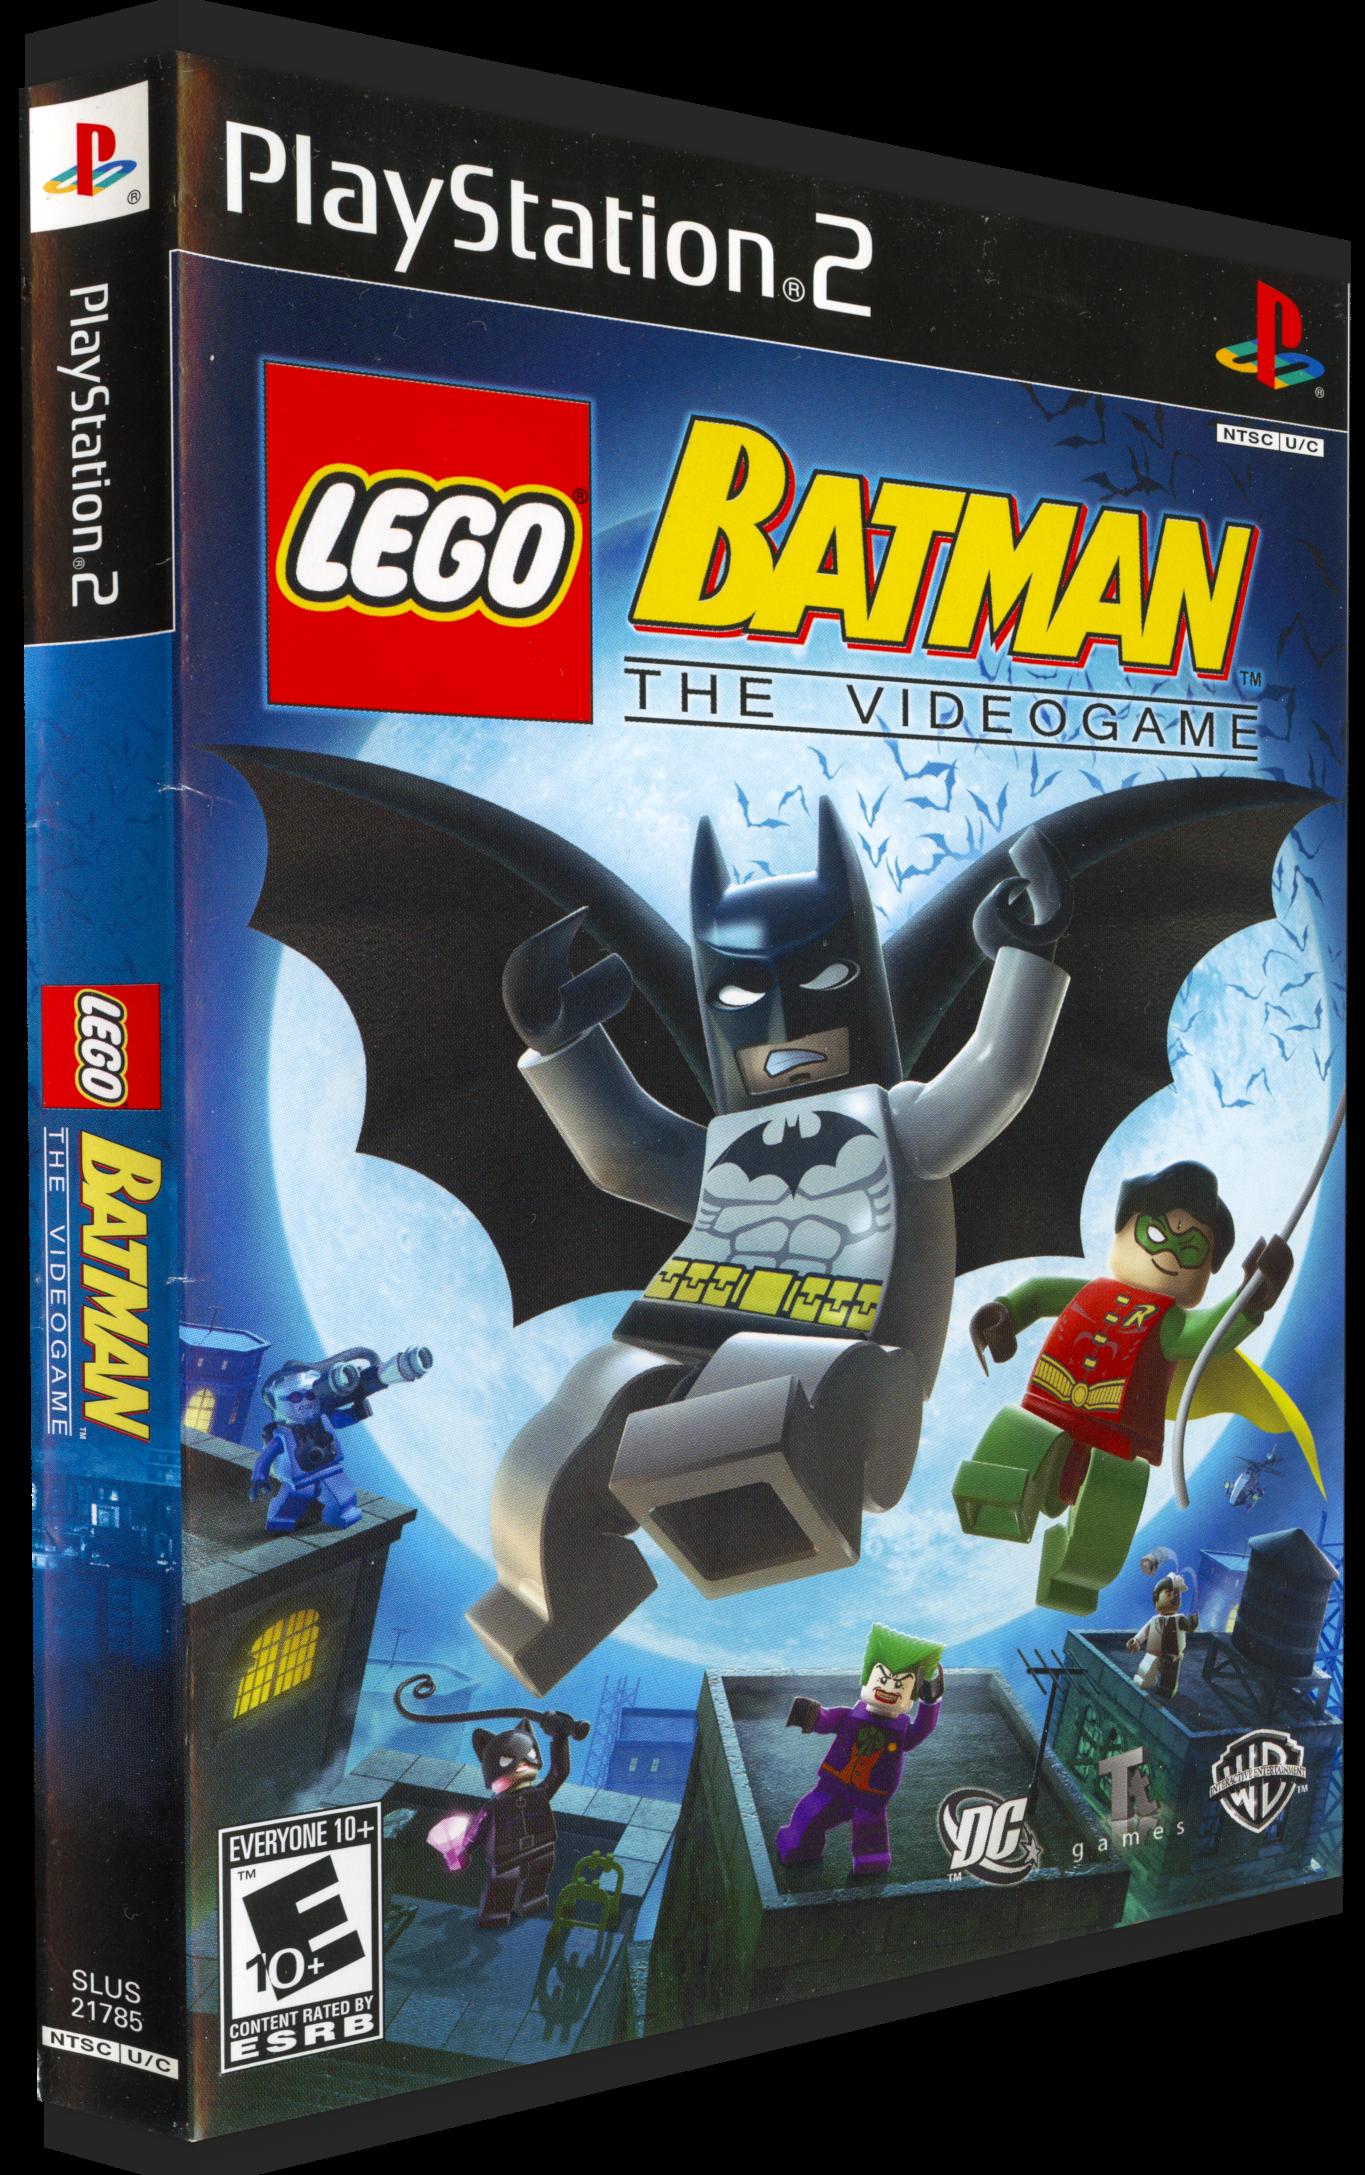 LEGO Batman: The Videogame Details - LaunchBox Games Database